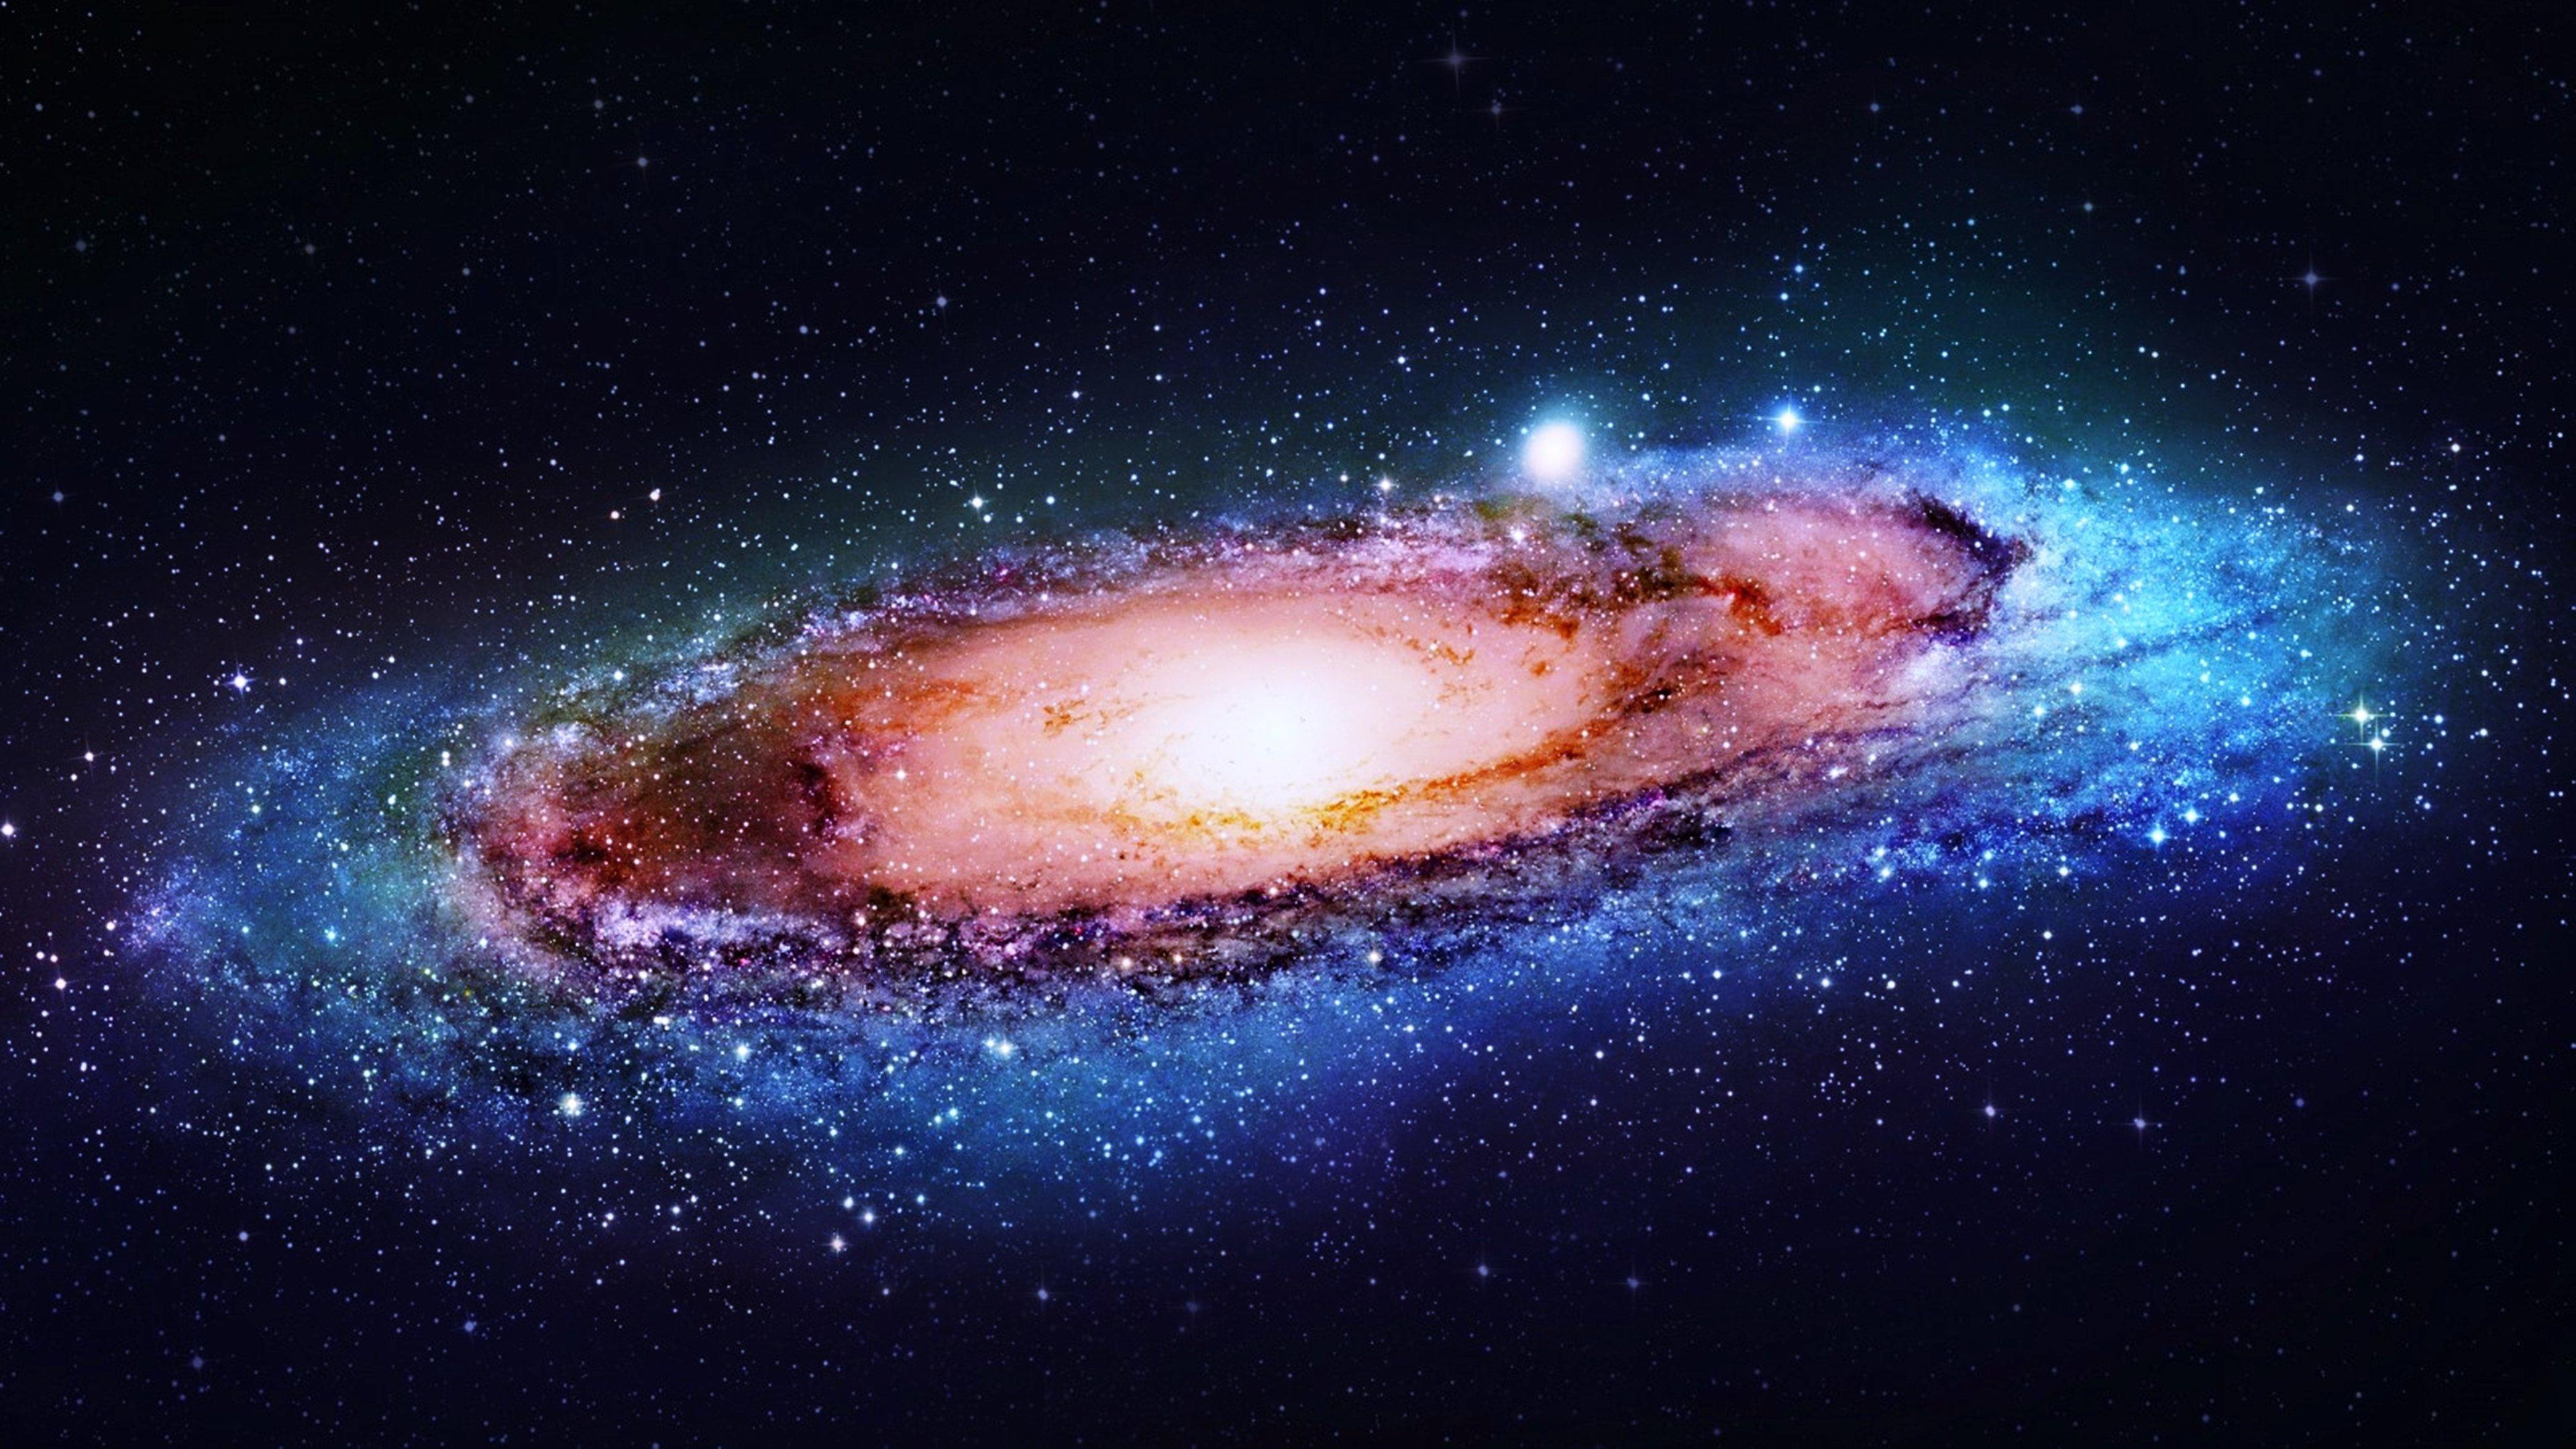 stars, Space, Galaxy, Milky Way, Nebula HD Wallpapers ...